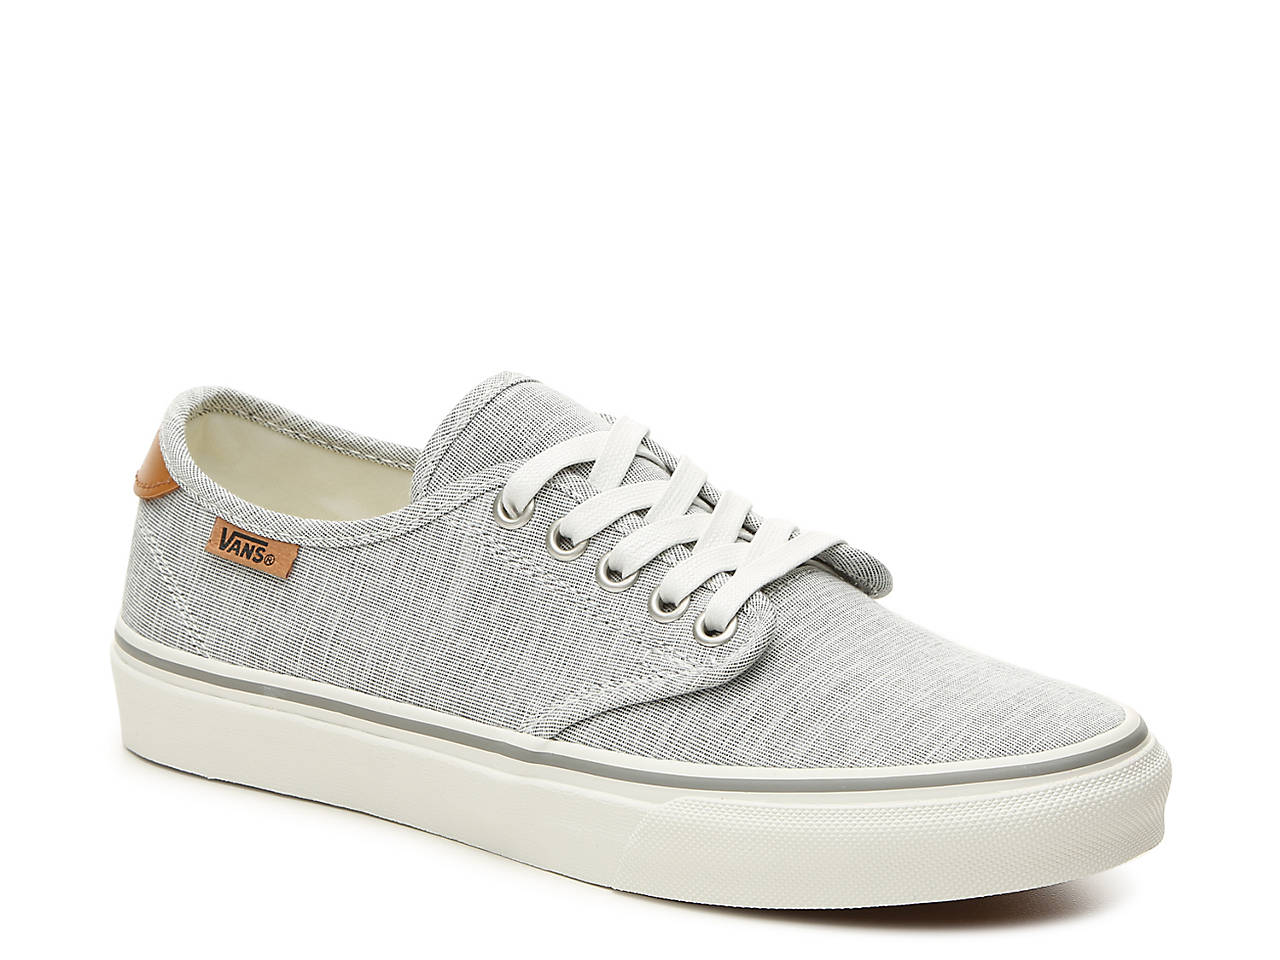 e7af4bb04a Vans Camden Deluxe Sneaker - Women s Women s Shoes